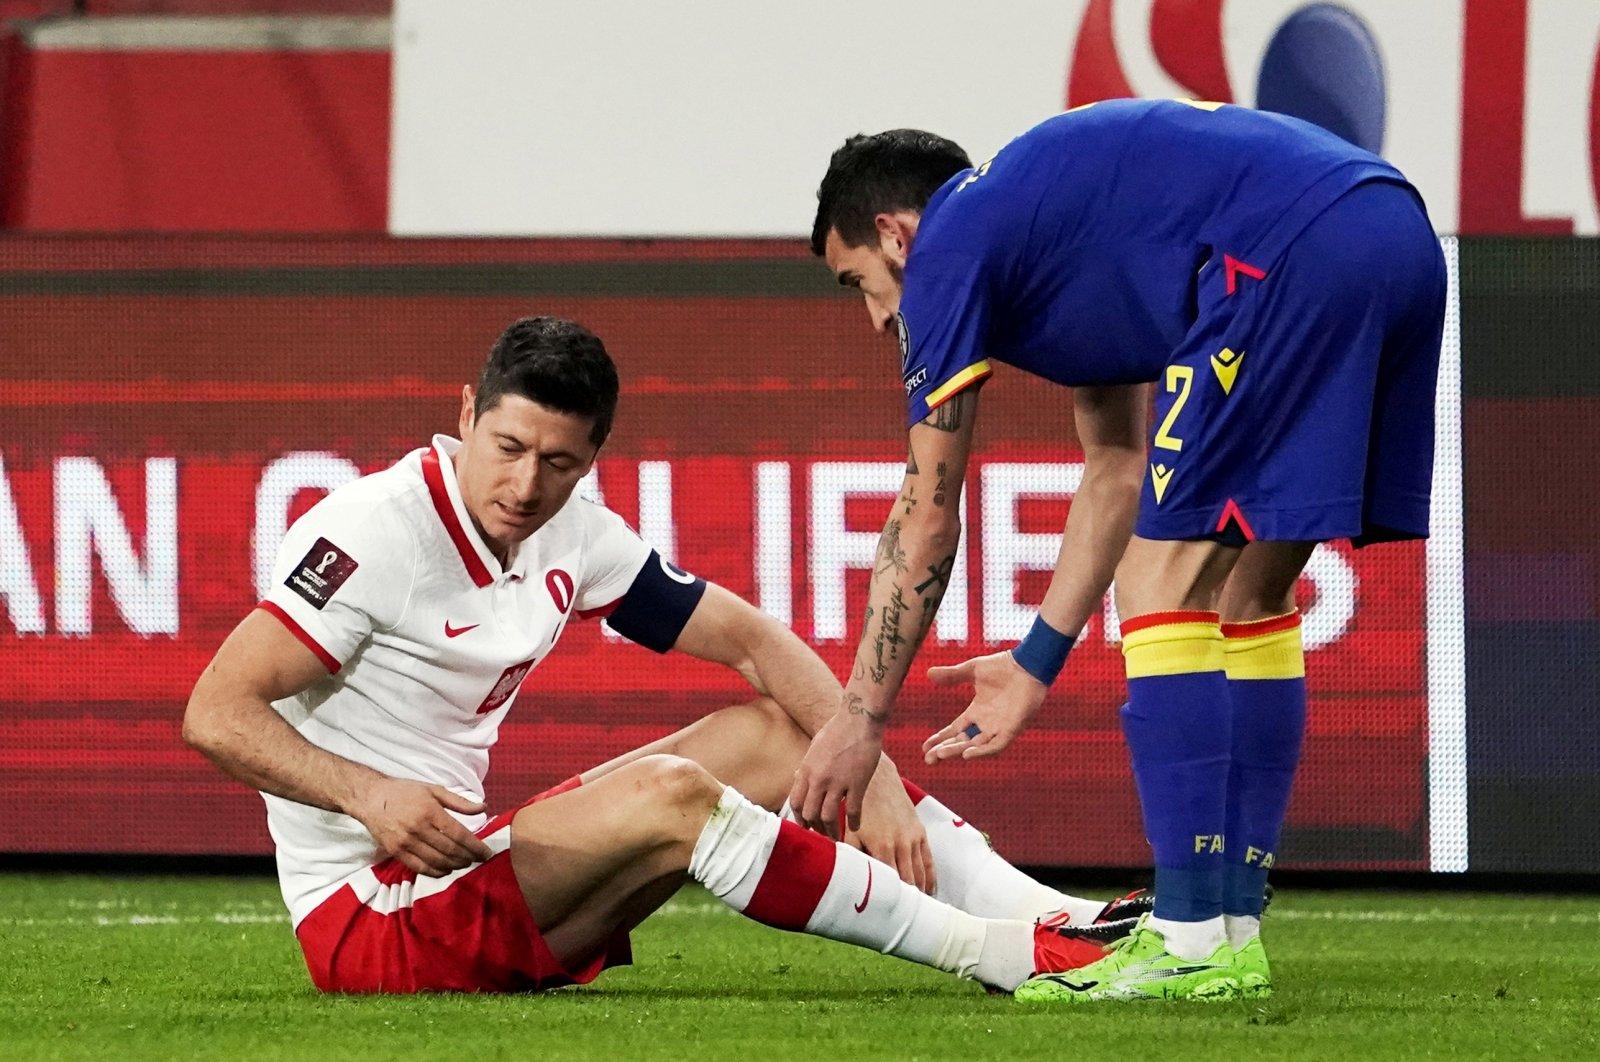 Poland's Robert Lewandowski (L) reacts after sustaining an injury as Andorra's Cristian Martinez looks on, Polish Army Stadium, Warsaw, Poland, March 28, 2021. (Reuters Photo)